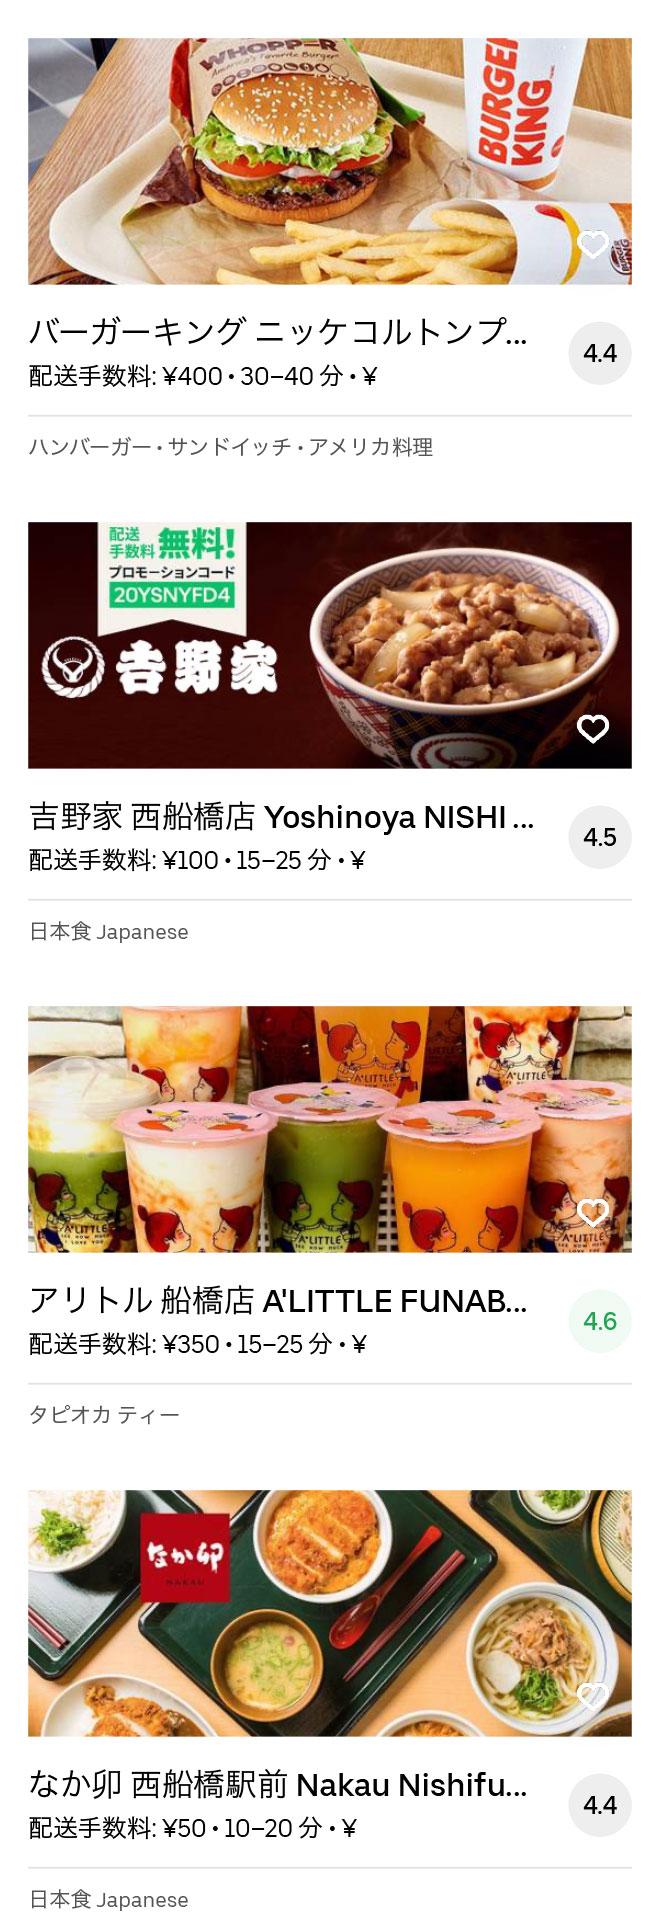 Funabashi nishi menu 2004 03